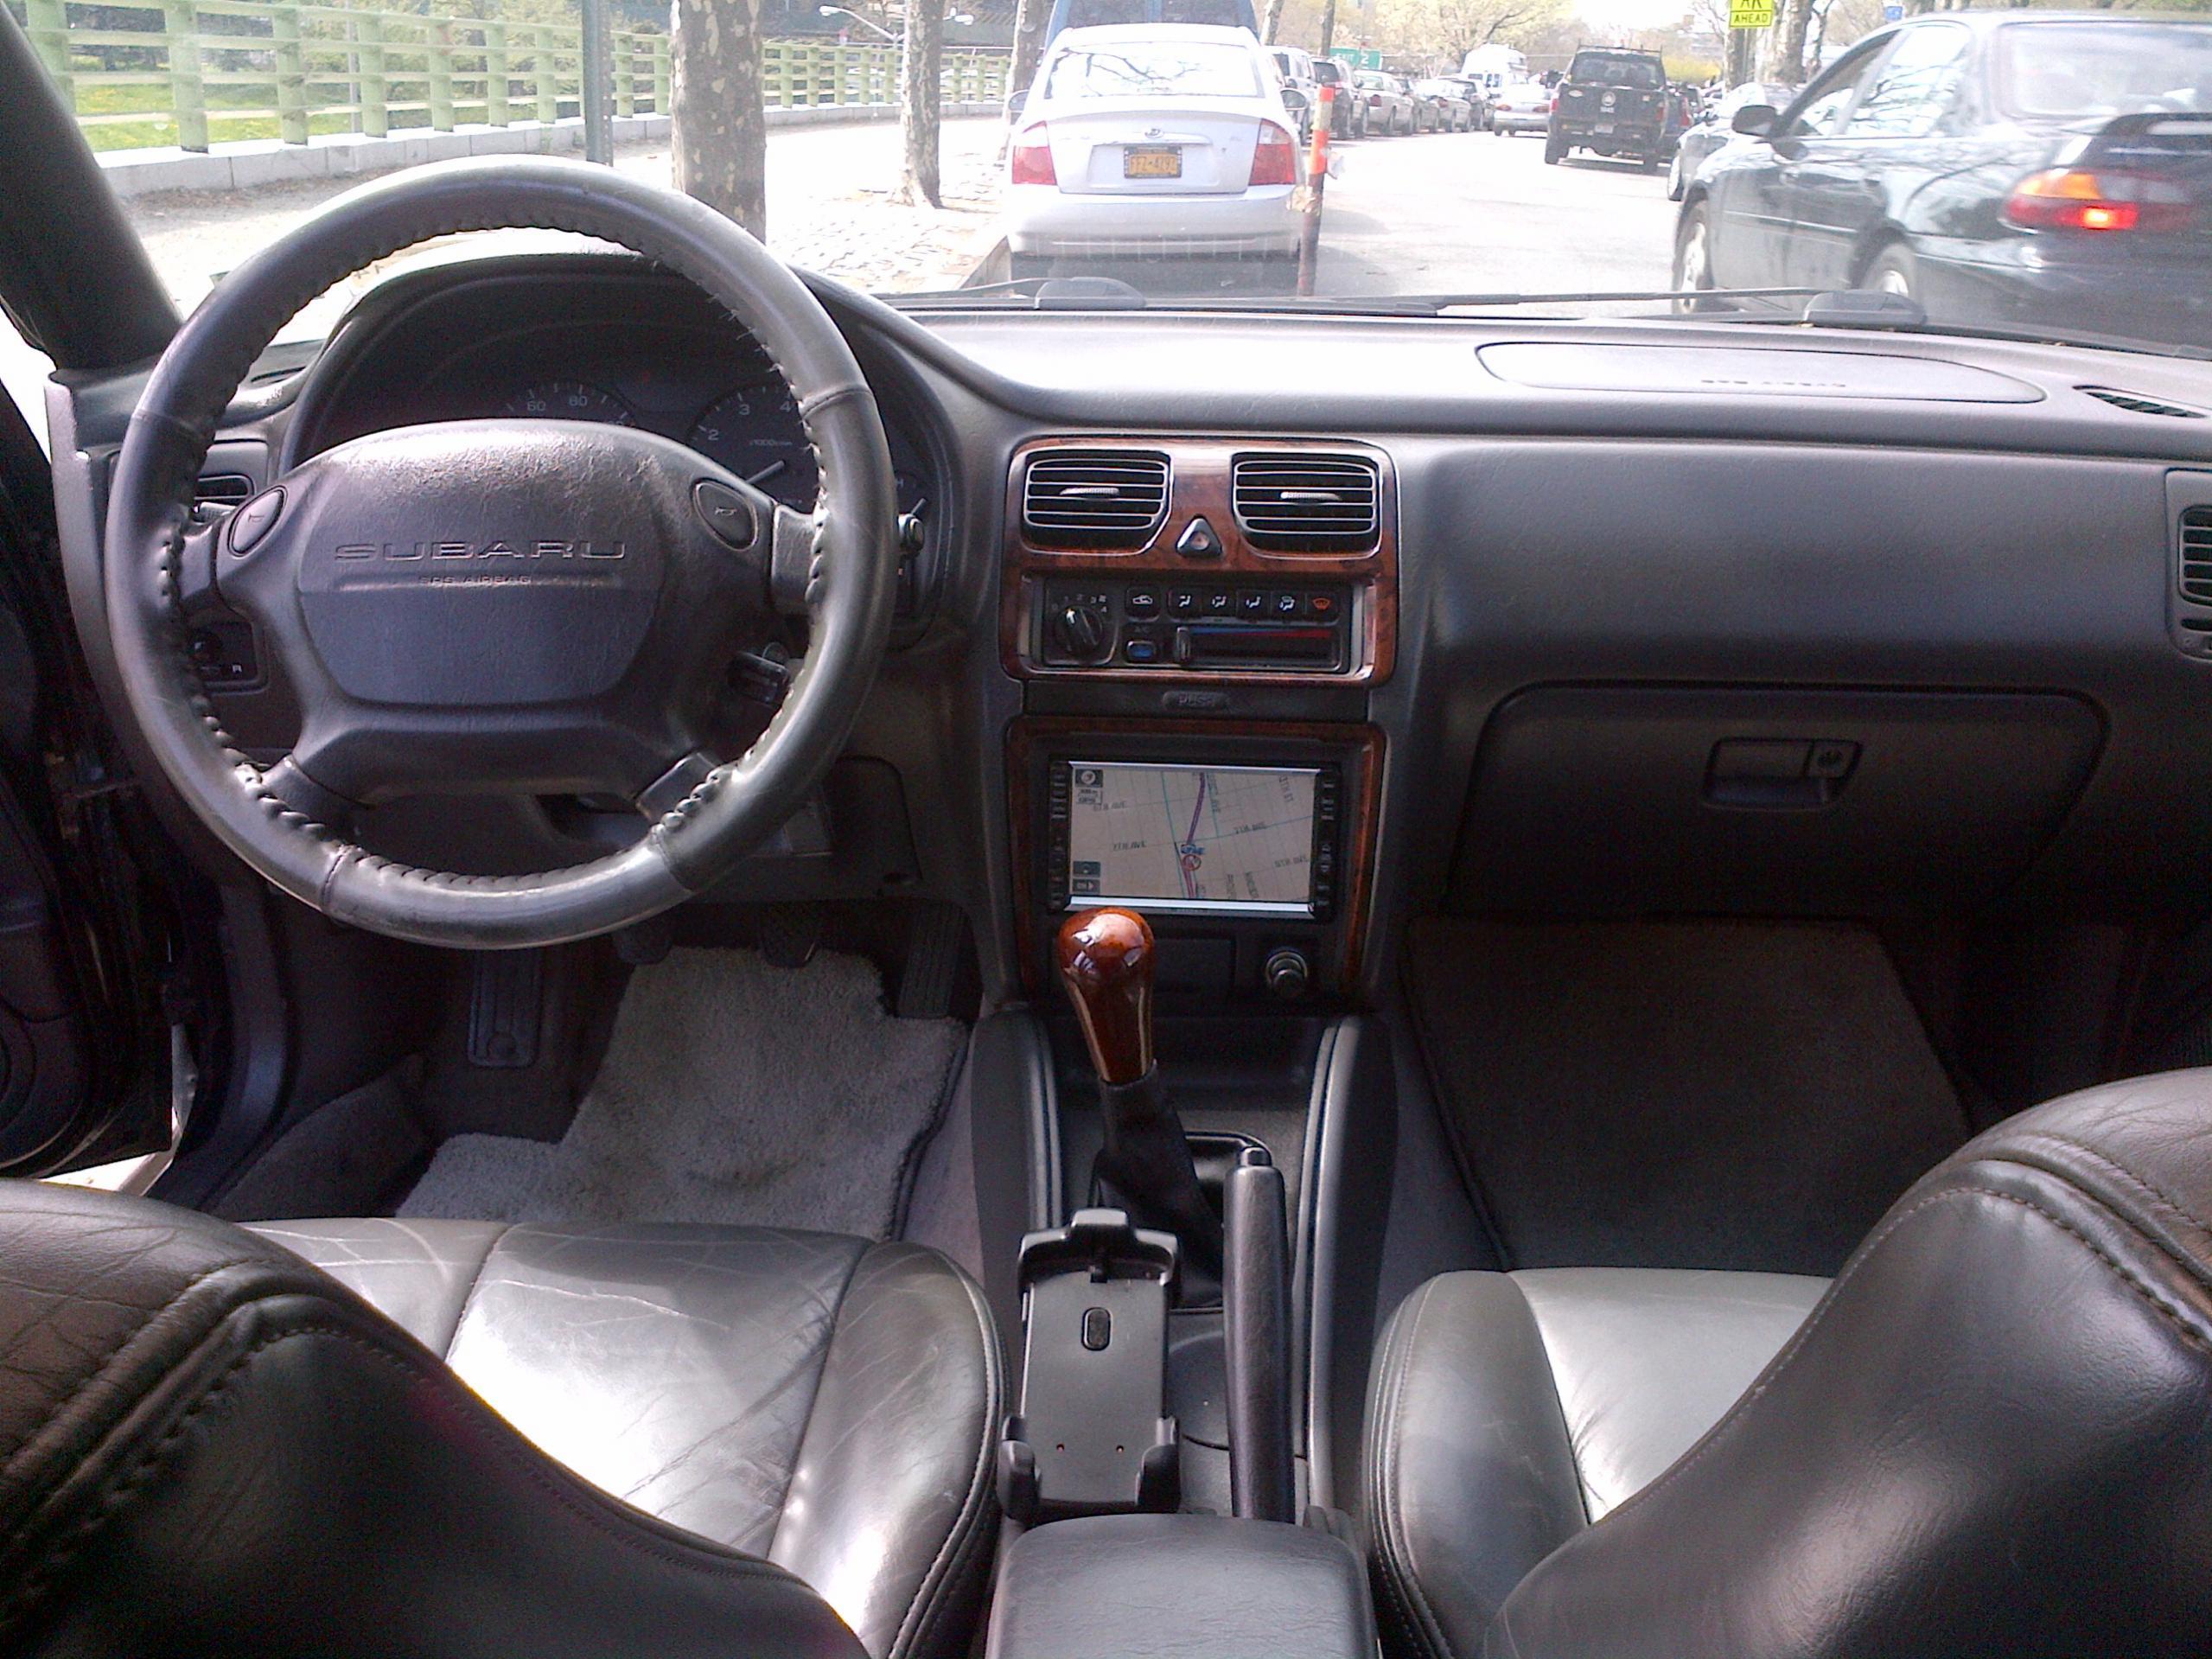 Subaru Legacy: Light control switch